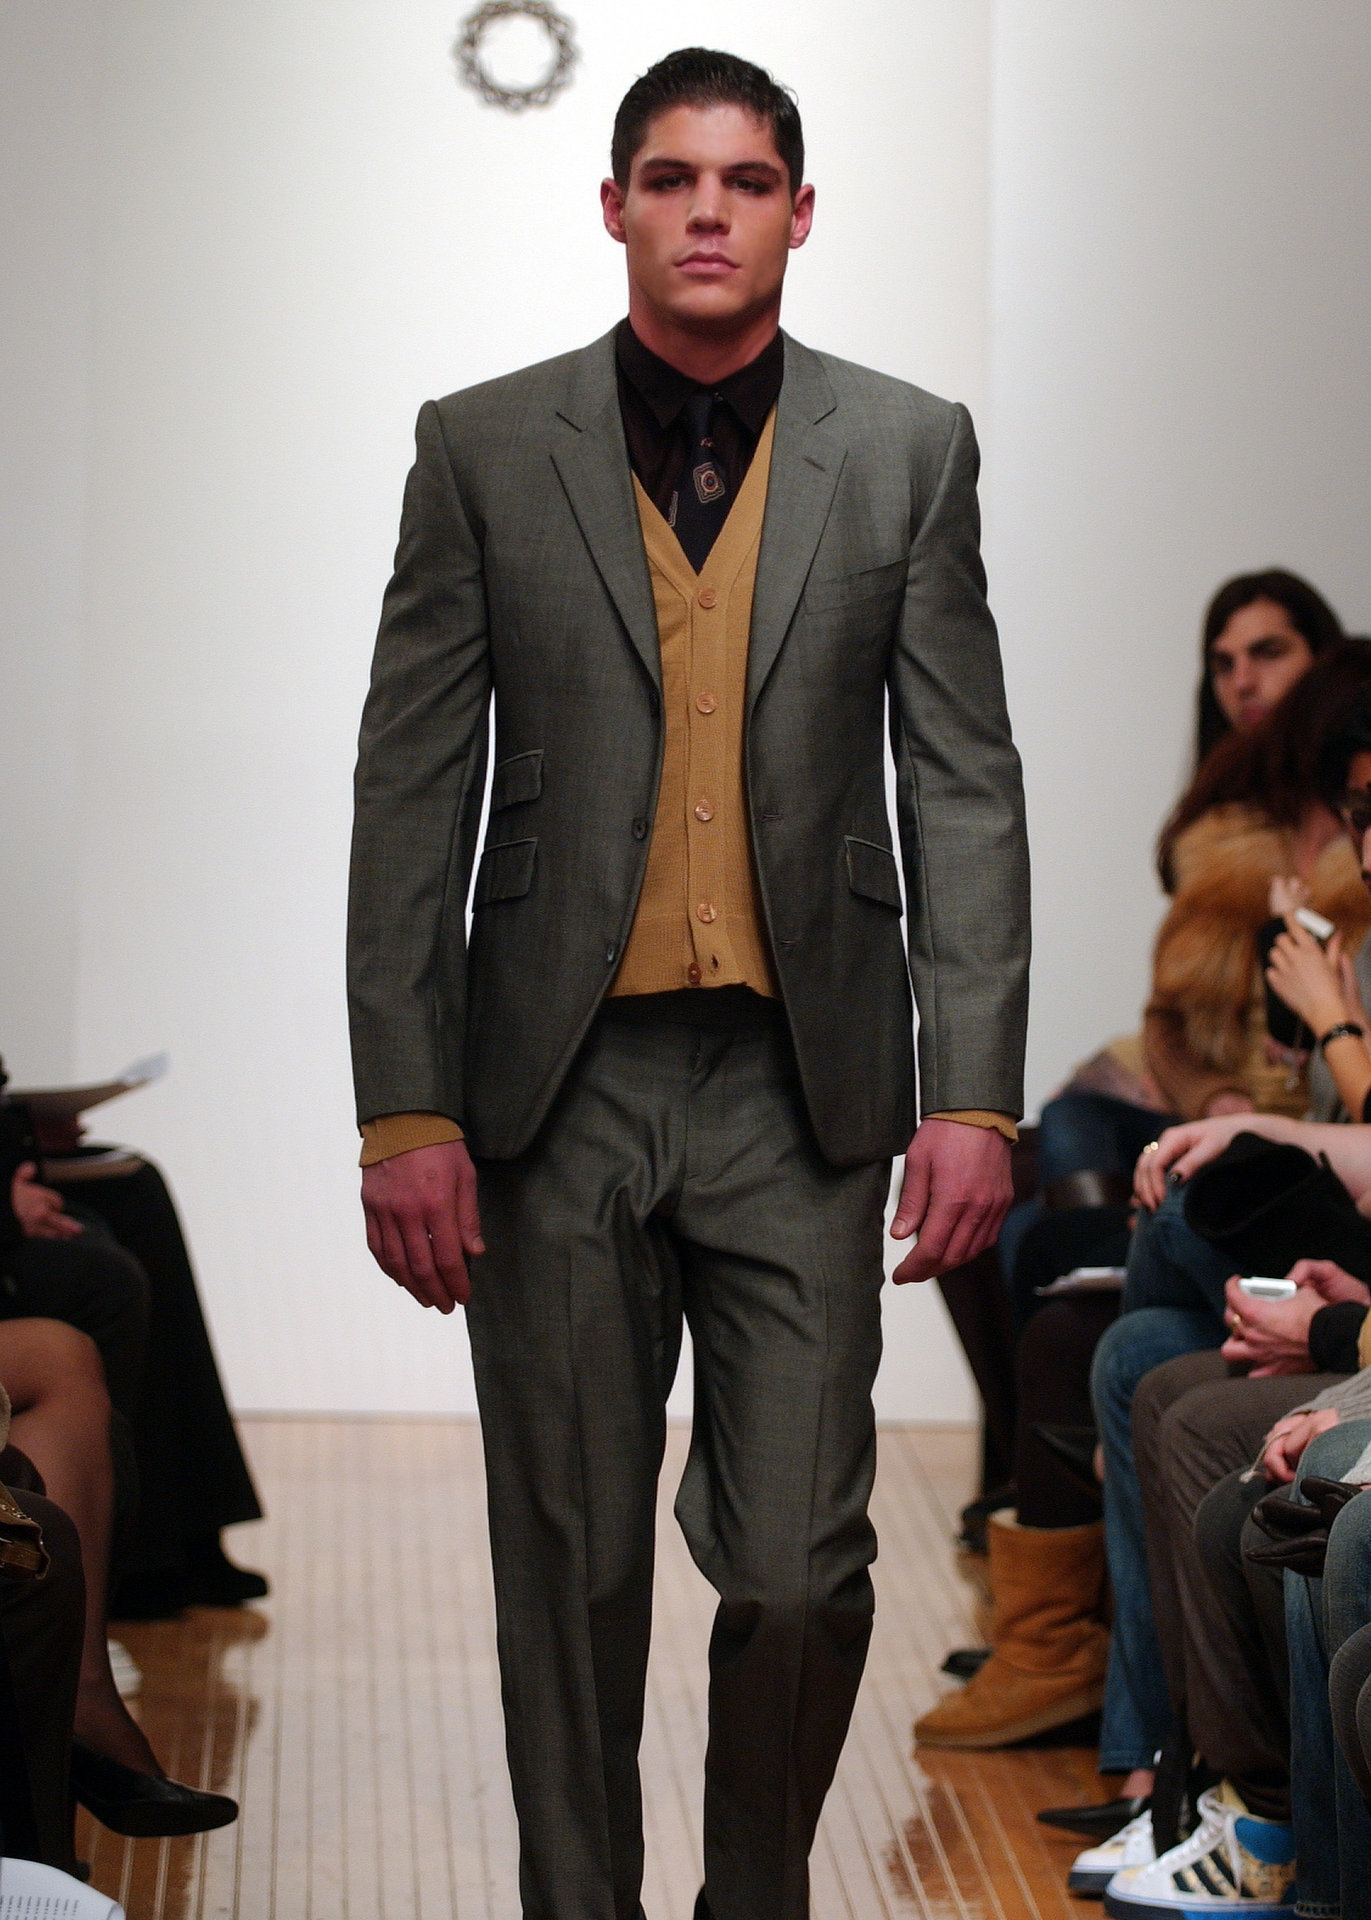 5JOHN+grey+suit